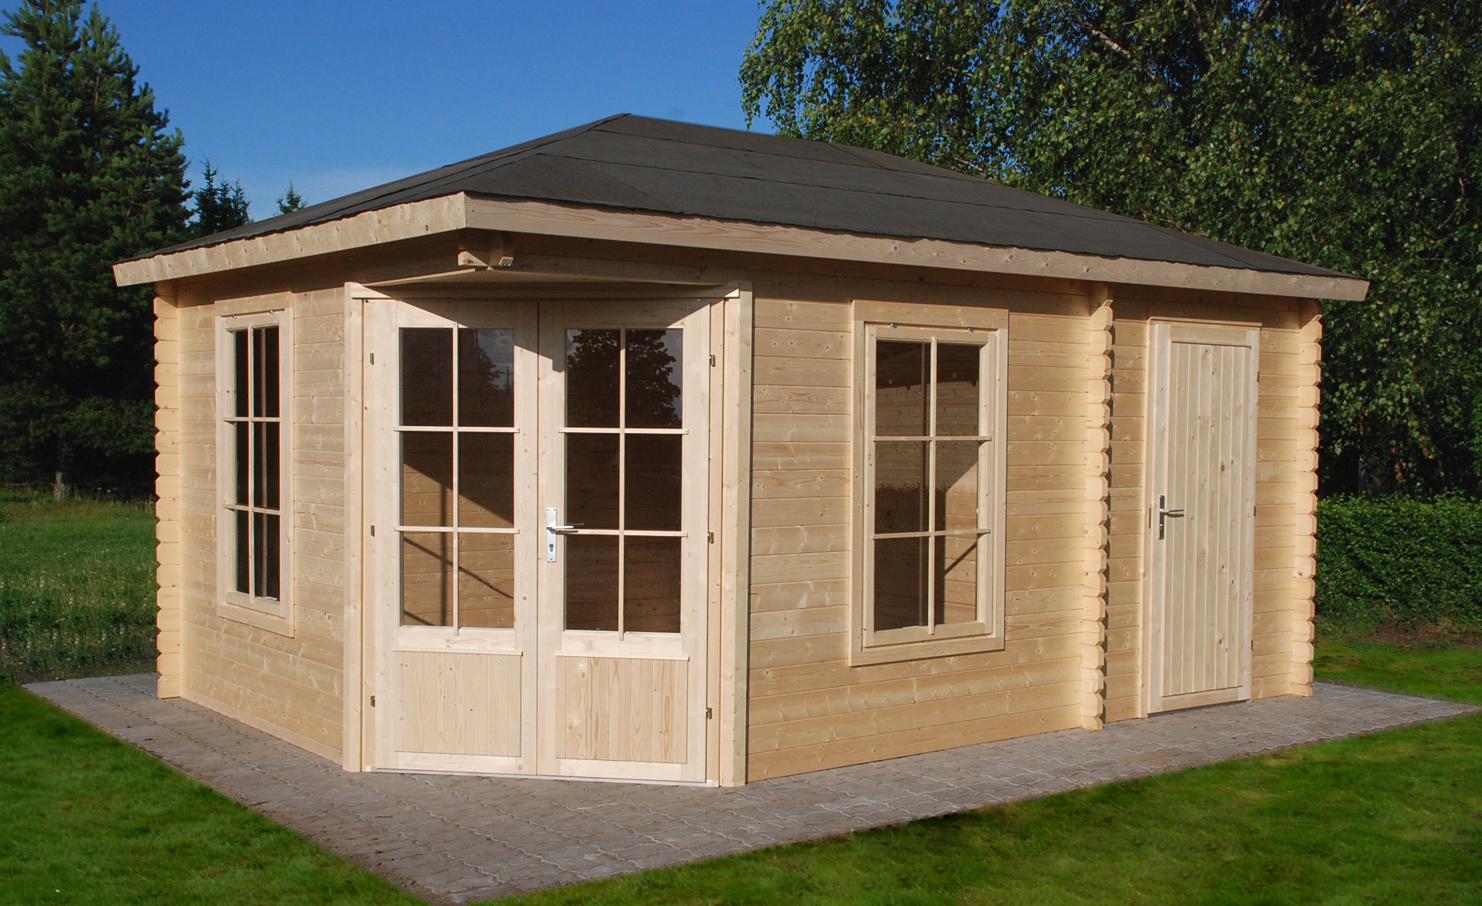 5 eck gartenhaus modell lauri 40. Black Bedroom Furniture Sets. Home Design Ideas